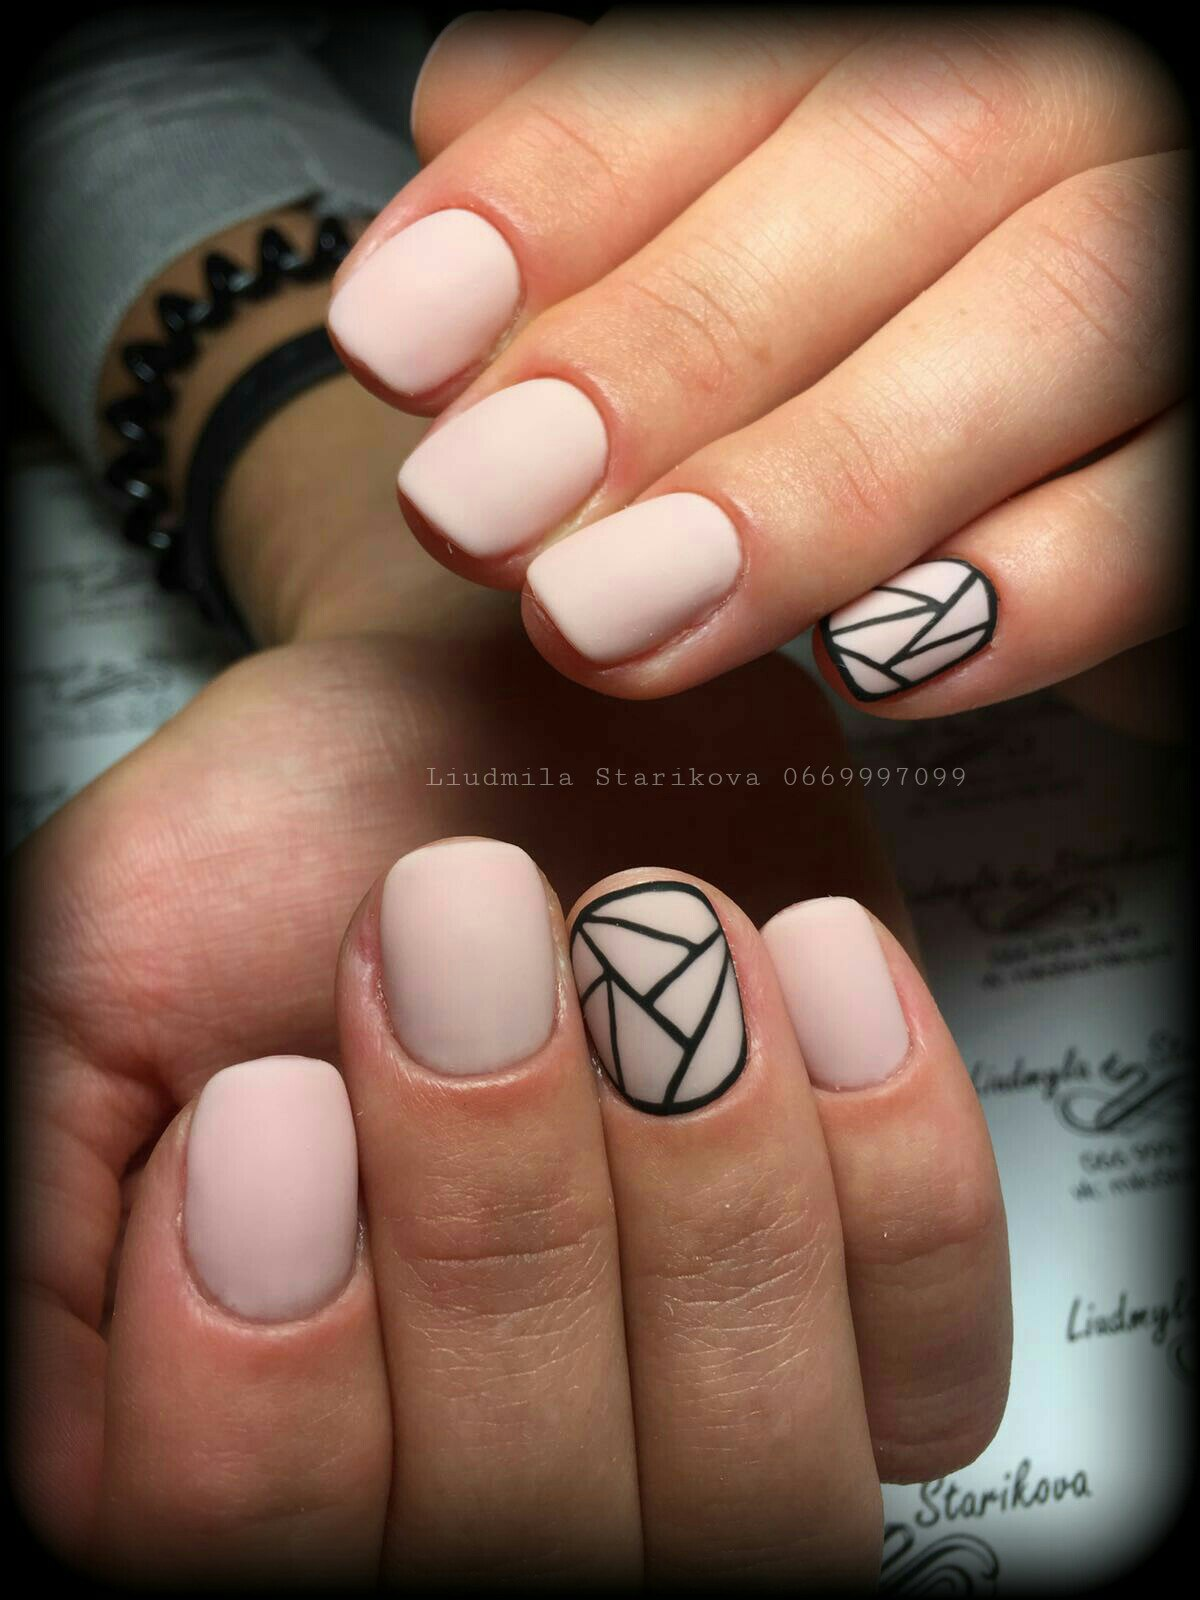 фото маникюра на короткие ногти с рисунком